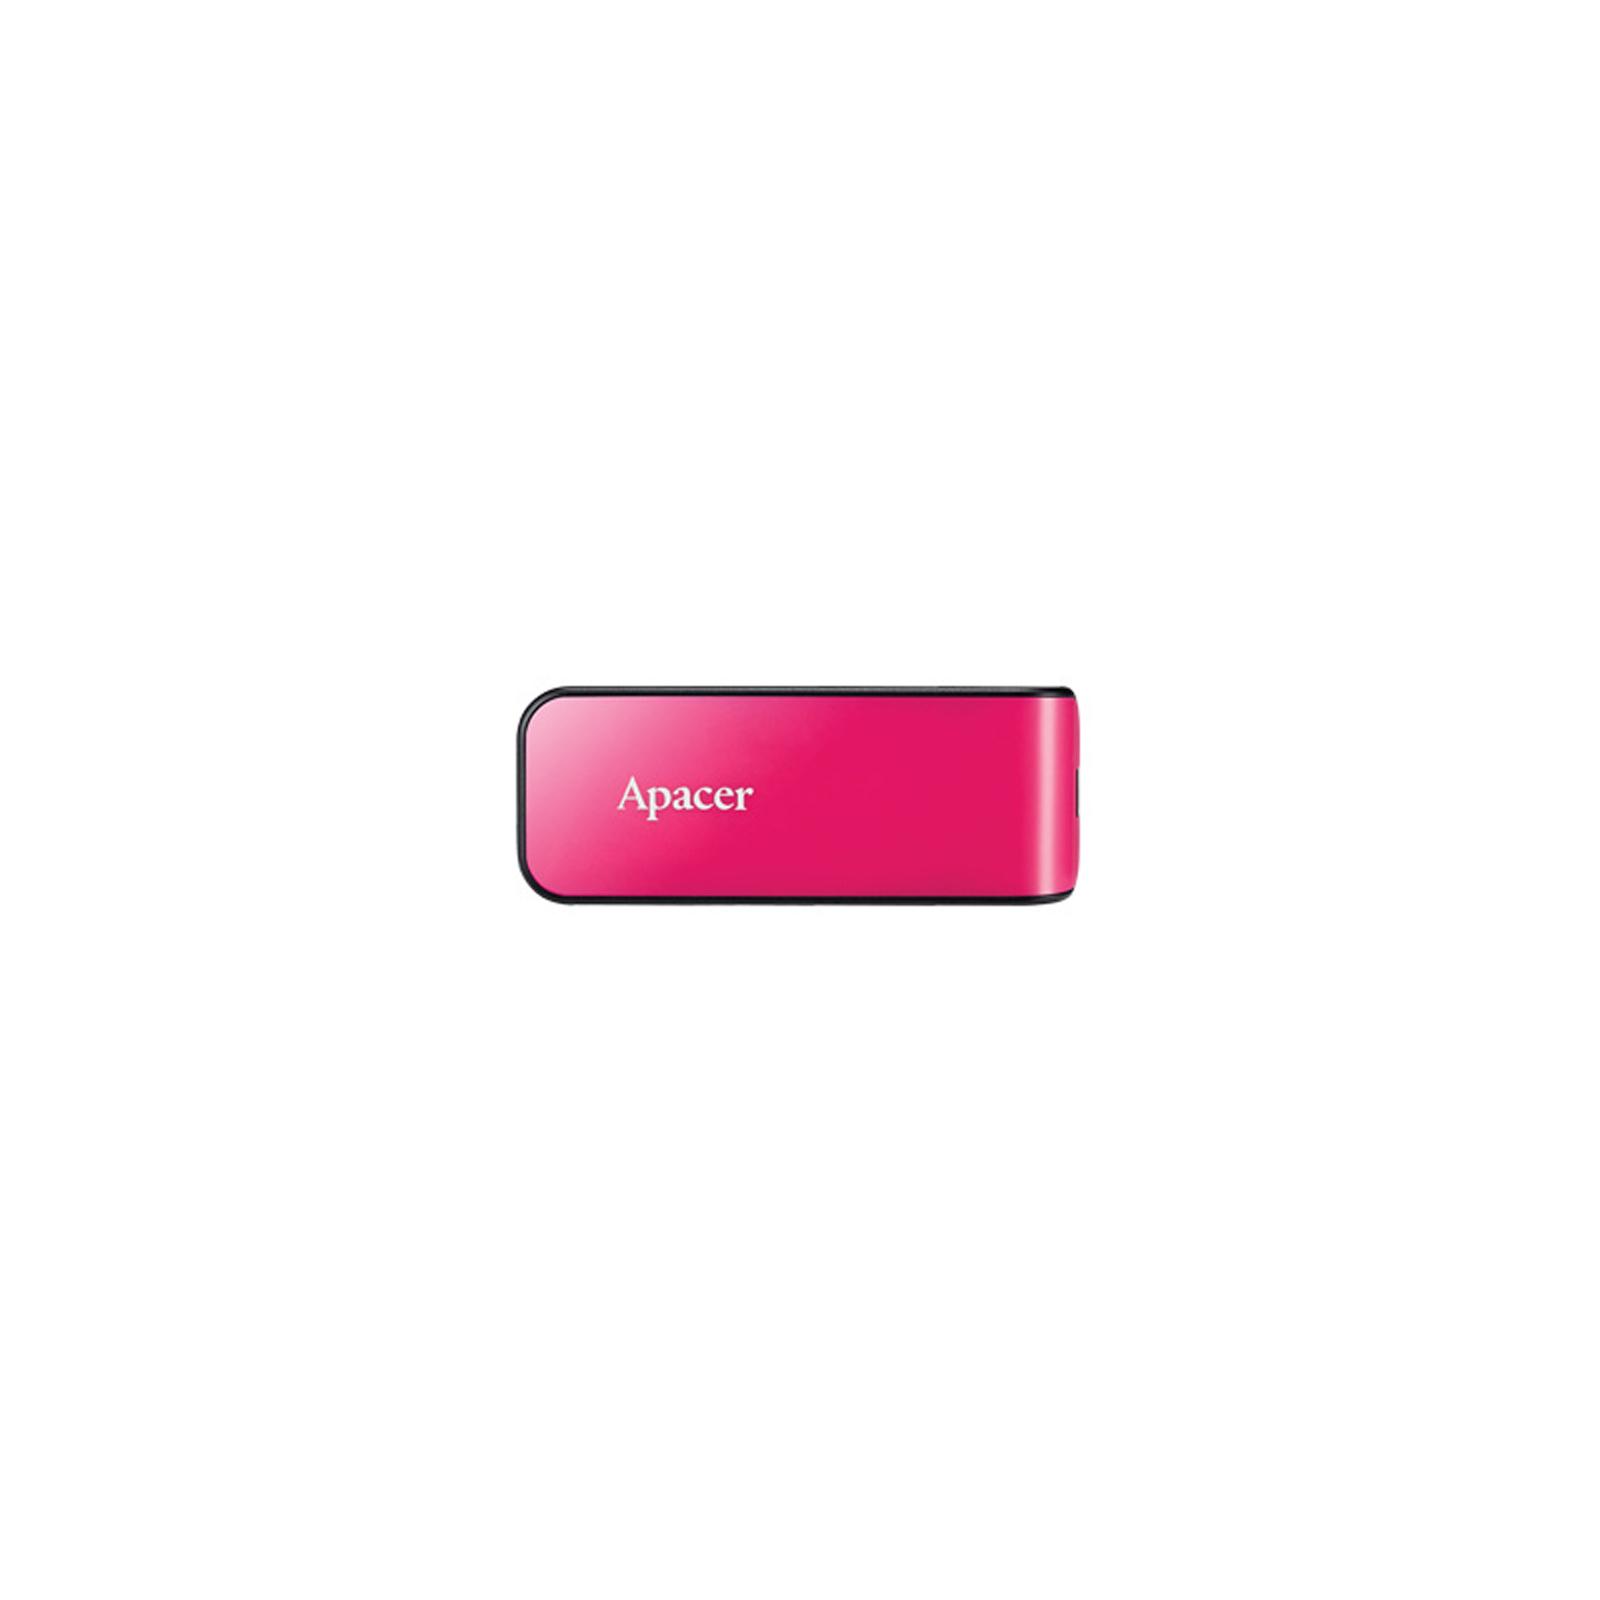 USB флеш накопитель Apacer 16GB AH334 pink USB 2.0 (AP16GAH334P-1)